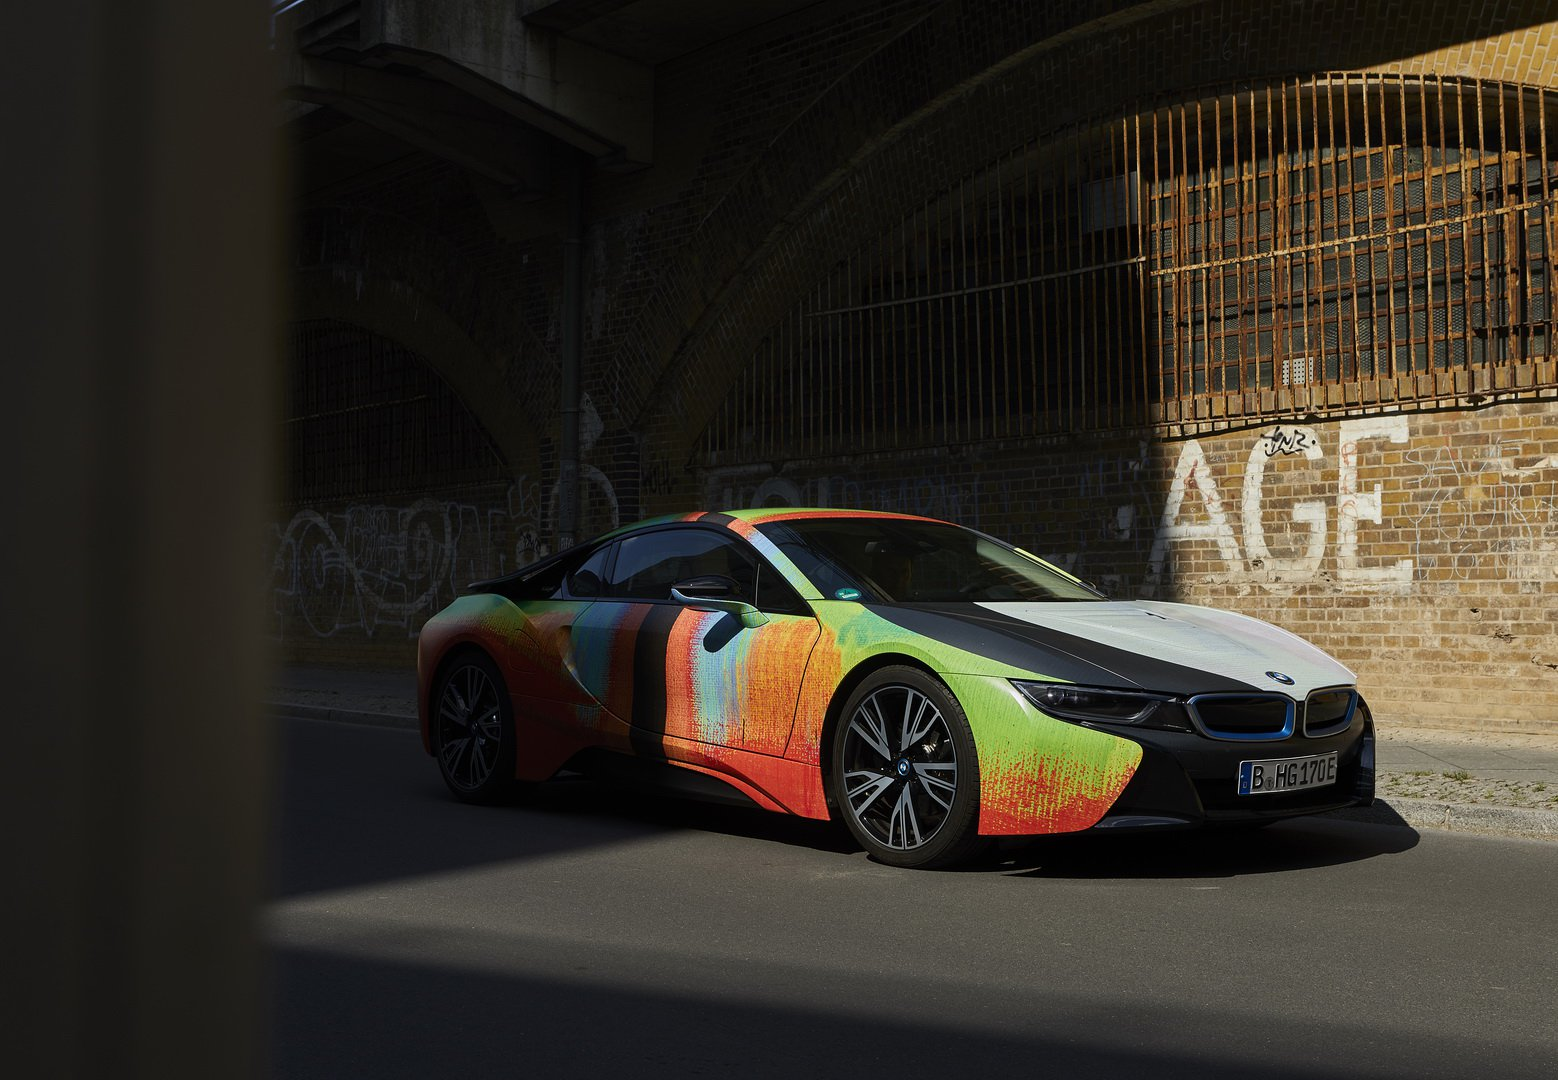 BMW-i8-car-art-1